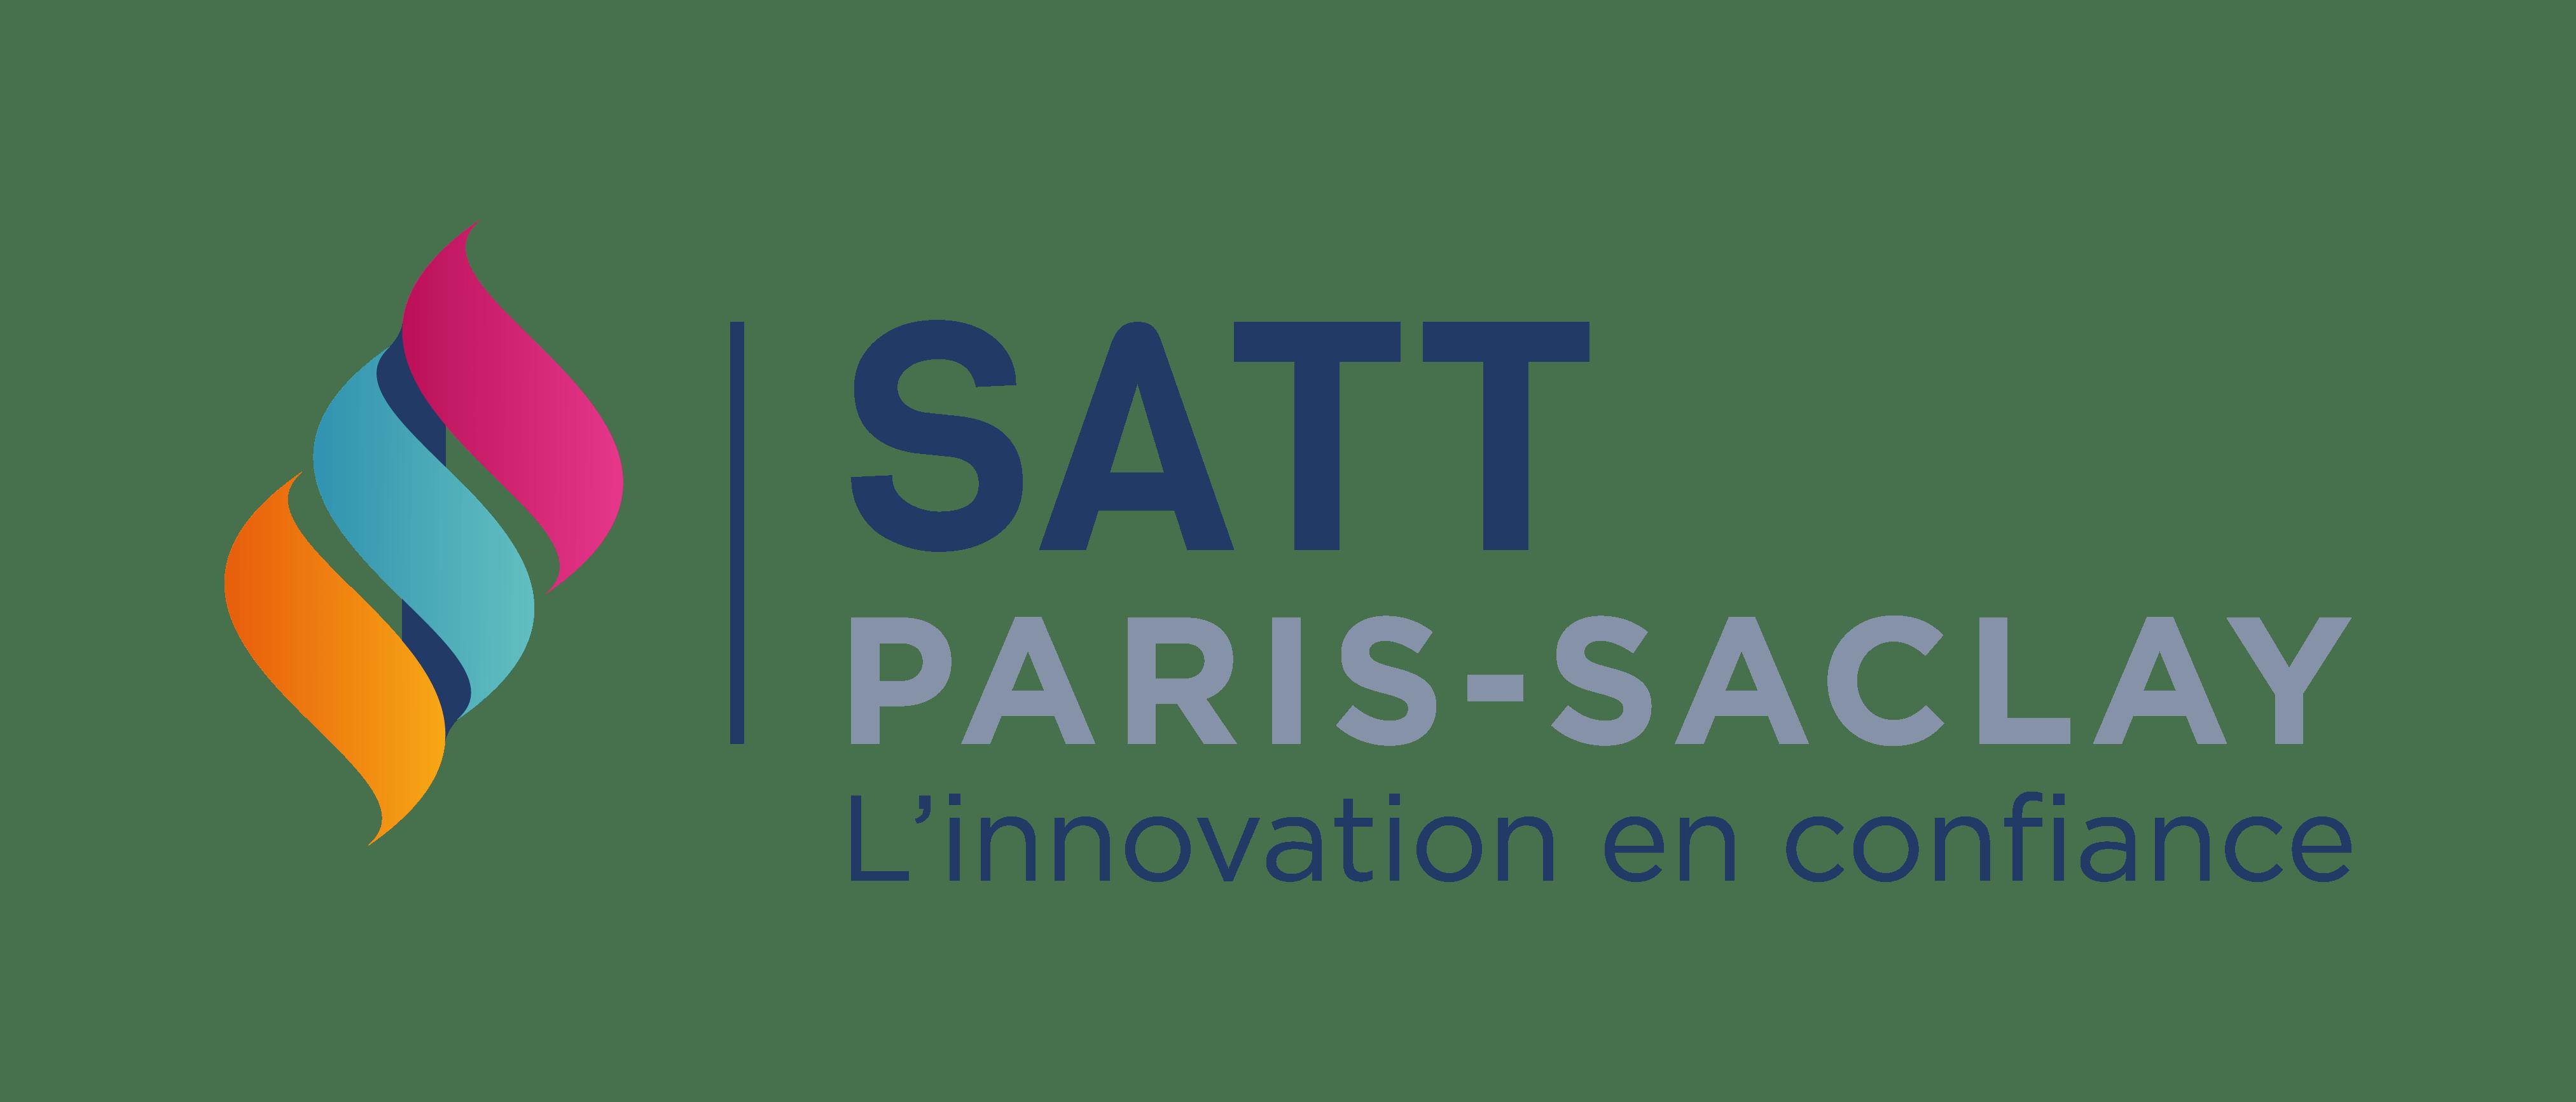 SATT Paris-Saclay